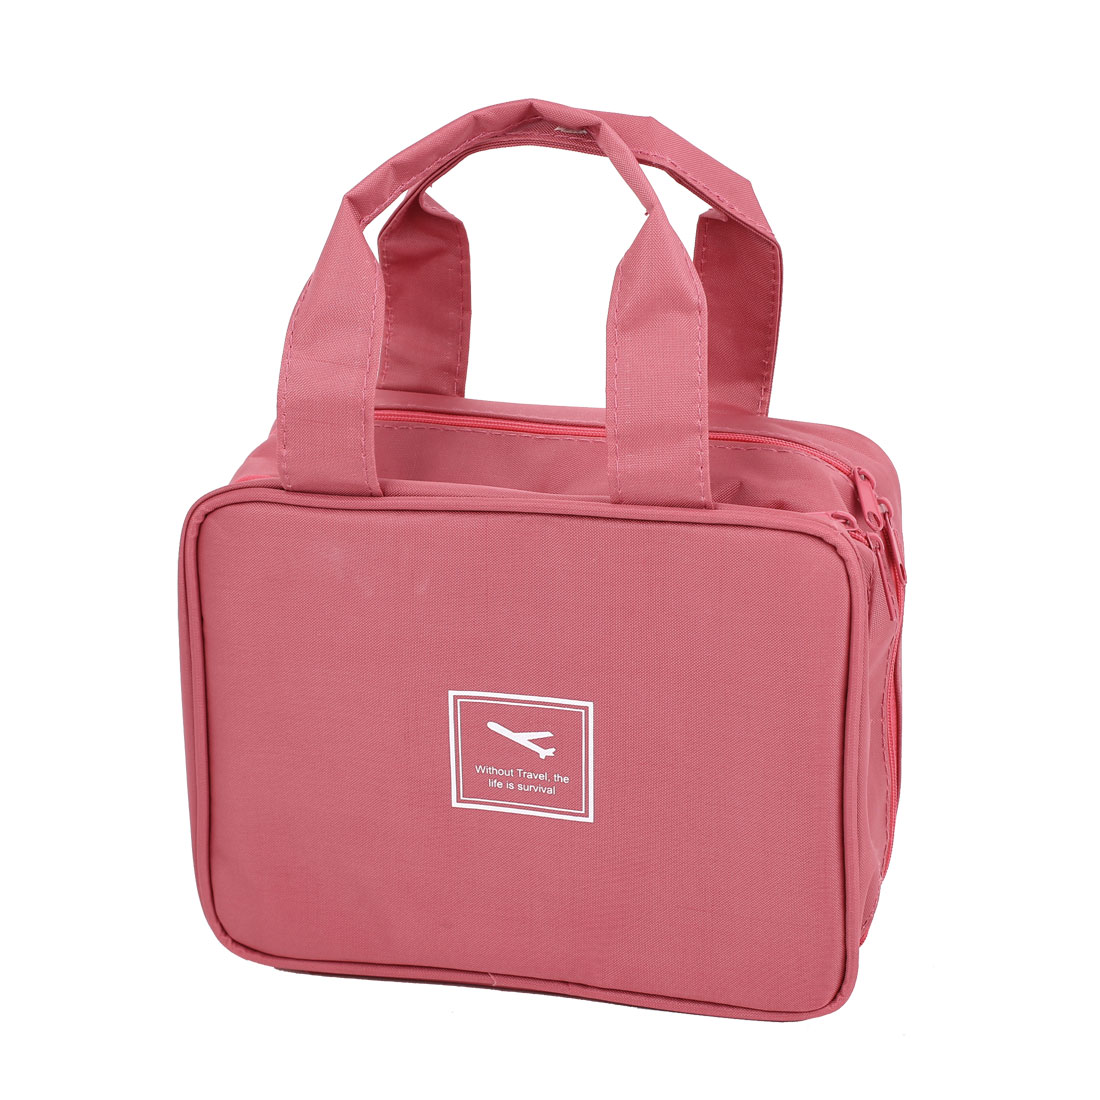 Outdoor Travel Toiletry Toiletries Cosmetic Beauty Wash Bag Handbag Fuchsia